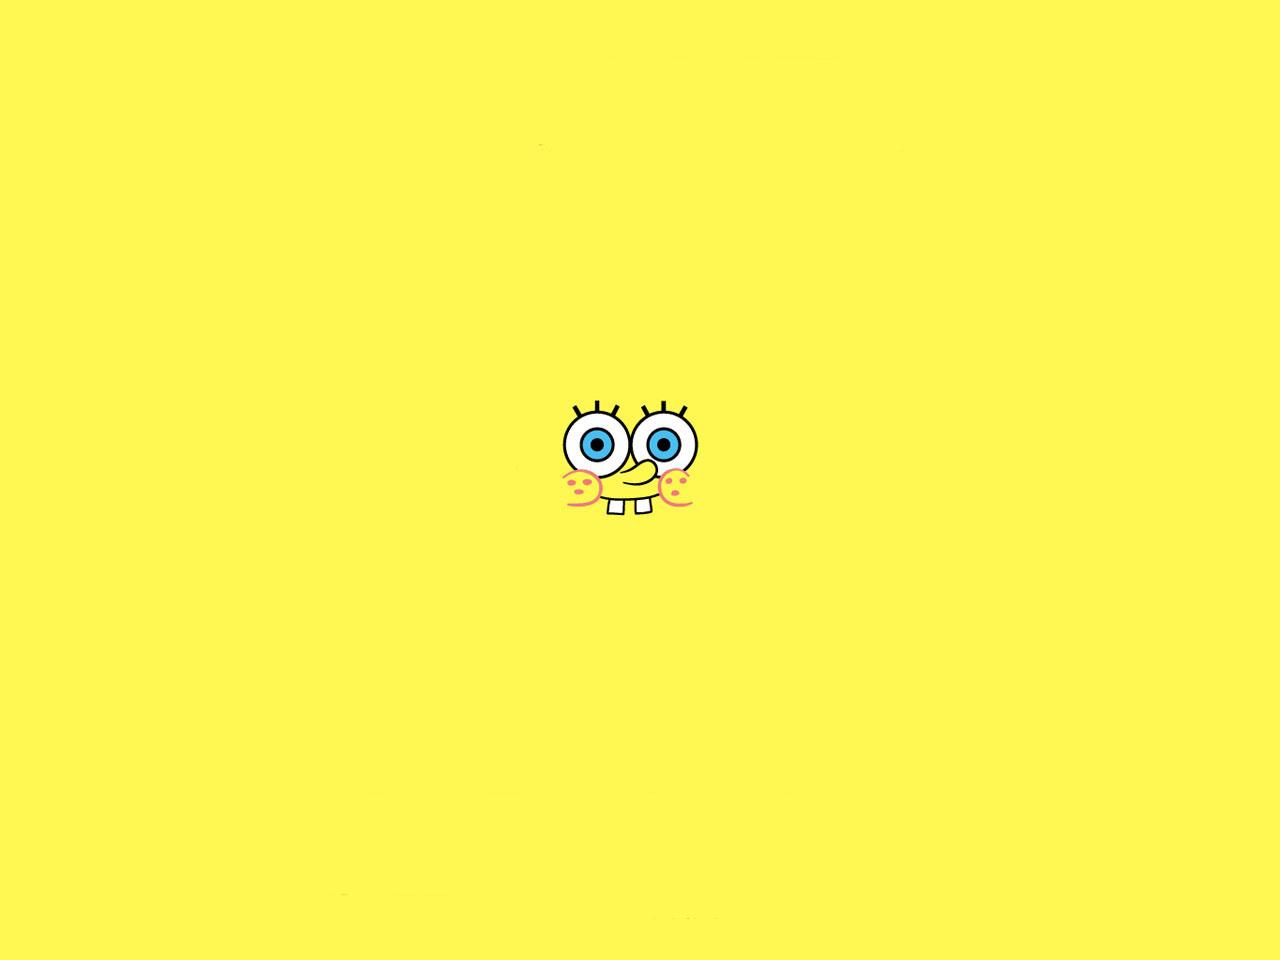 Spongebob Wallpaper Yellow 6471 Wallpaper WallDiskPaper 1280x960